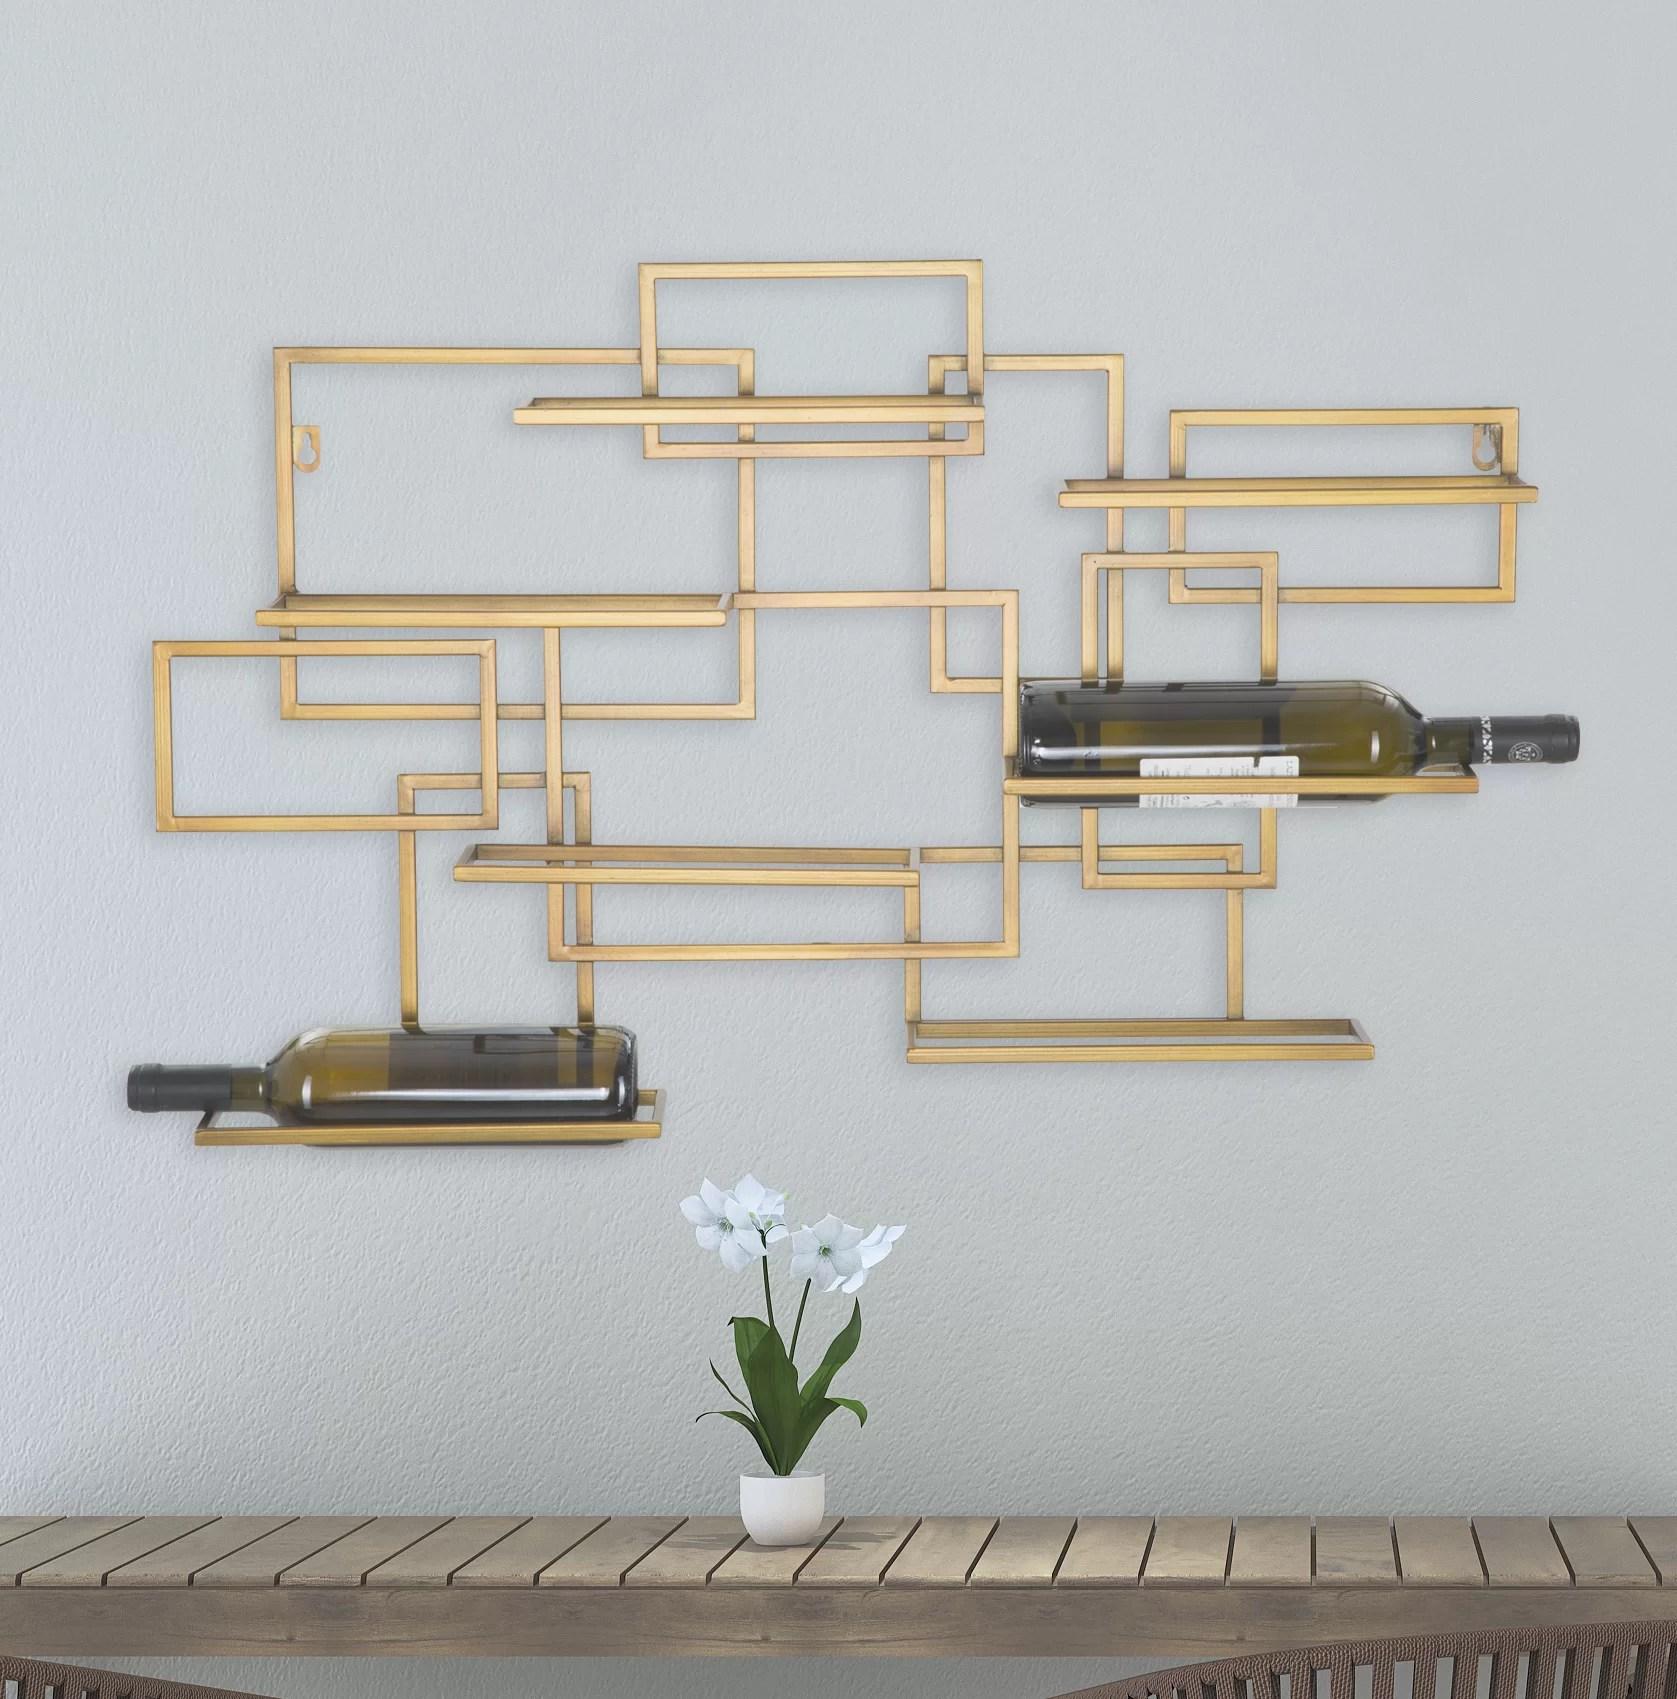 canora grey murry 7 bottle wall mounted wine rack reviews wayfair co uk